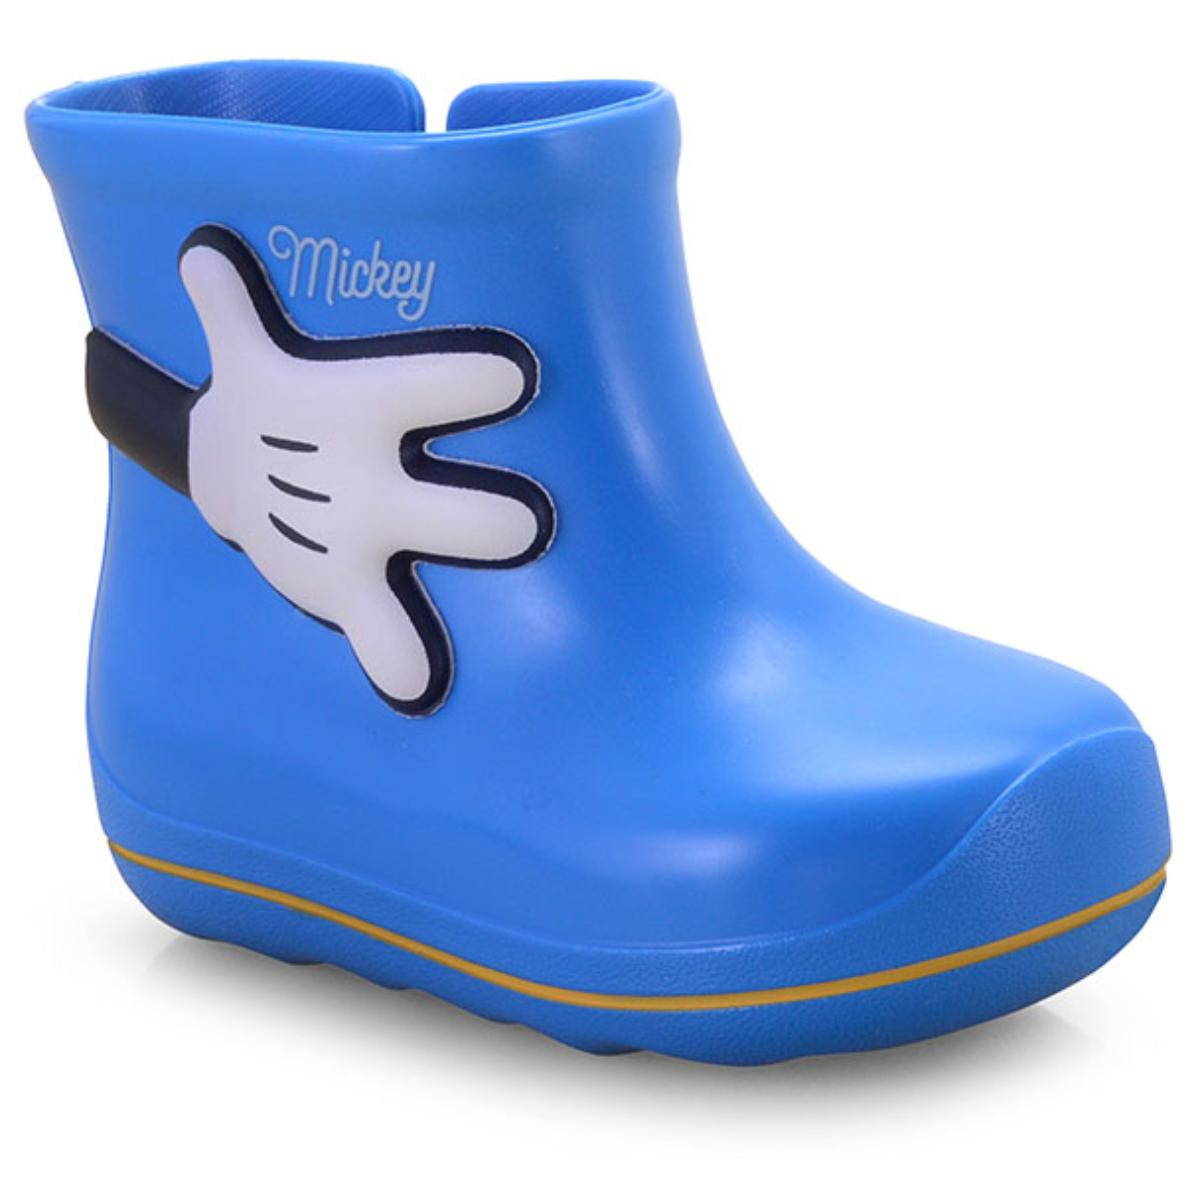 Galocha Masc Infantil Grendene 21987 01676 Disney Cute Azul Brilliant ff op